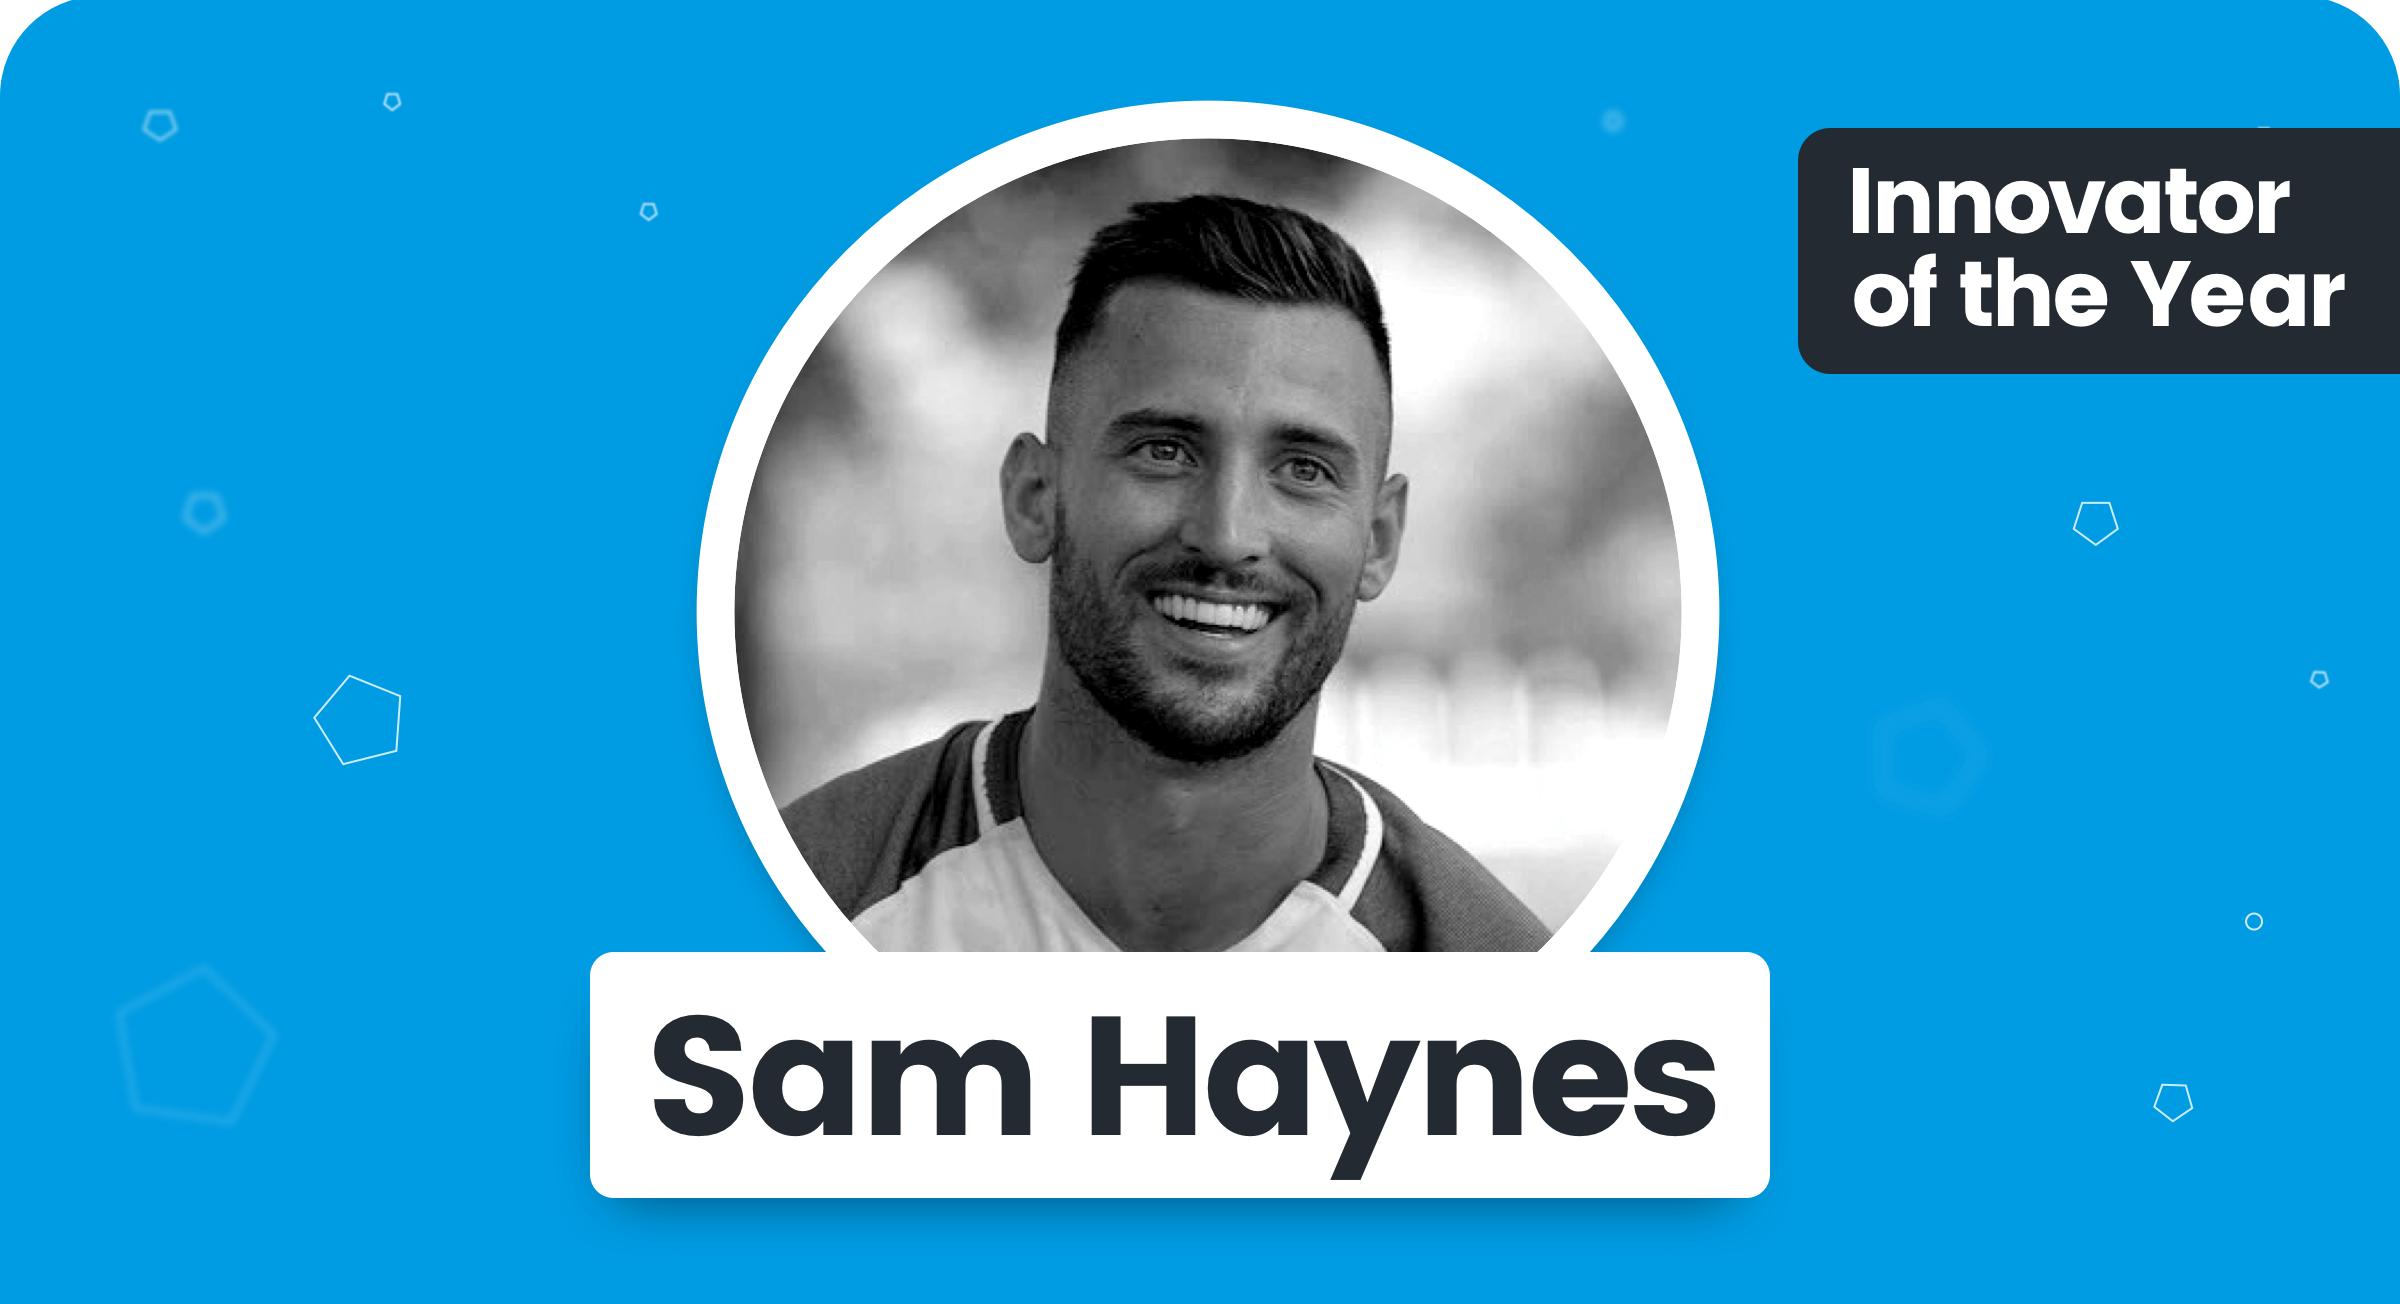 Sam Haynes - Innovator of the Year